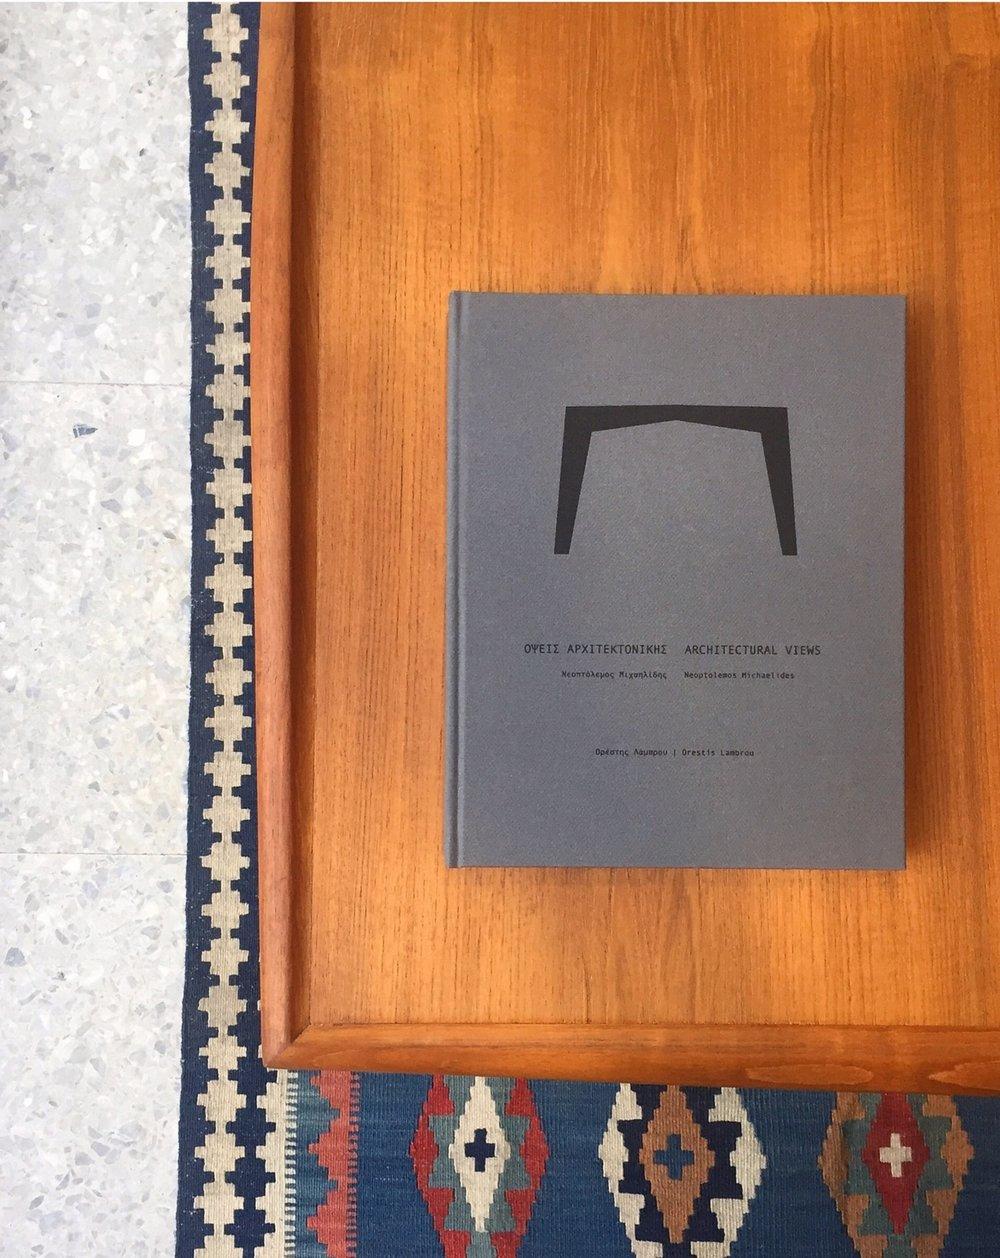 Architectural views / Neoptolemos Michaelides by Orestis Lambrou